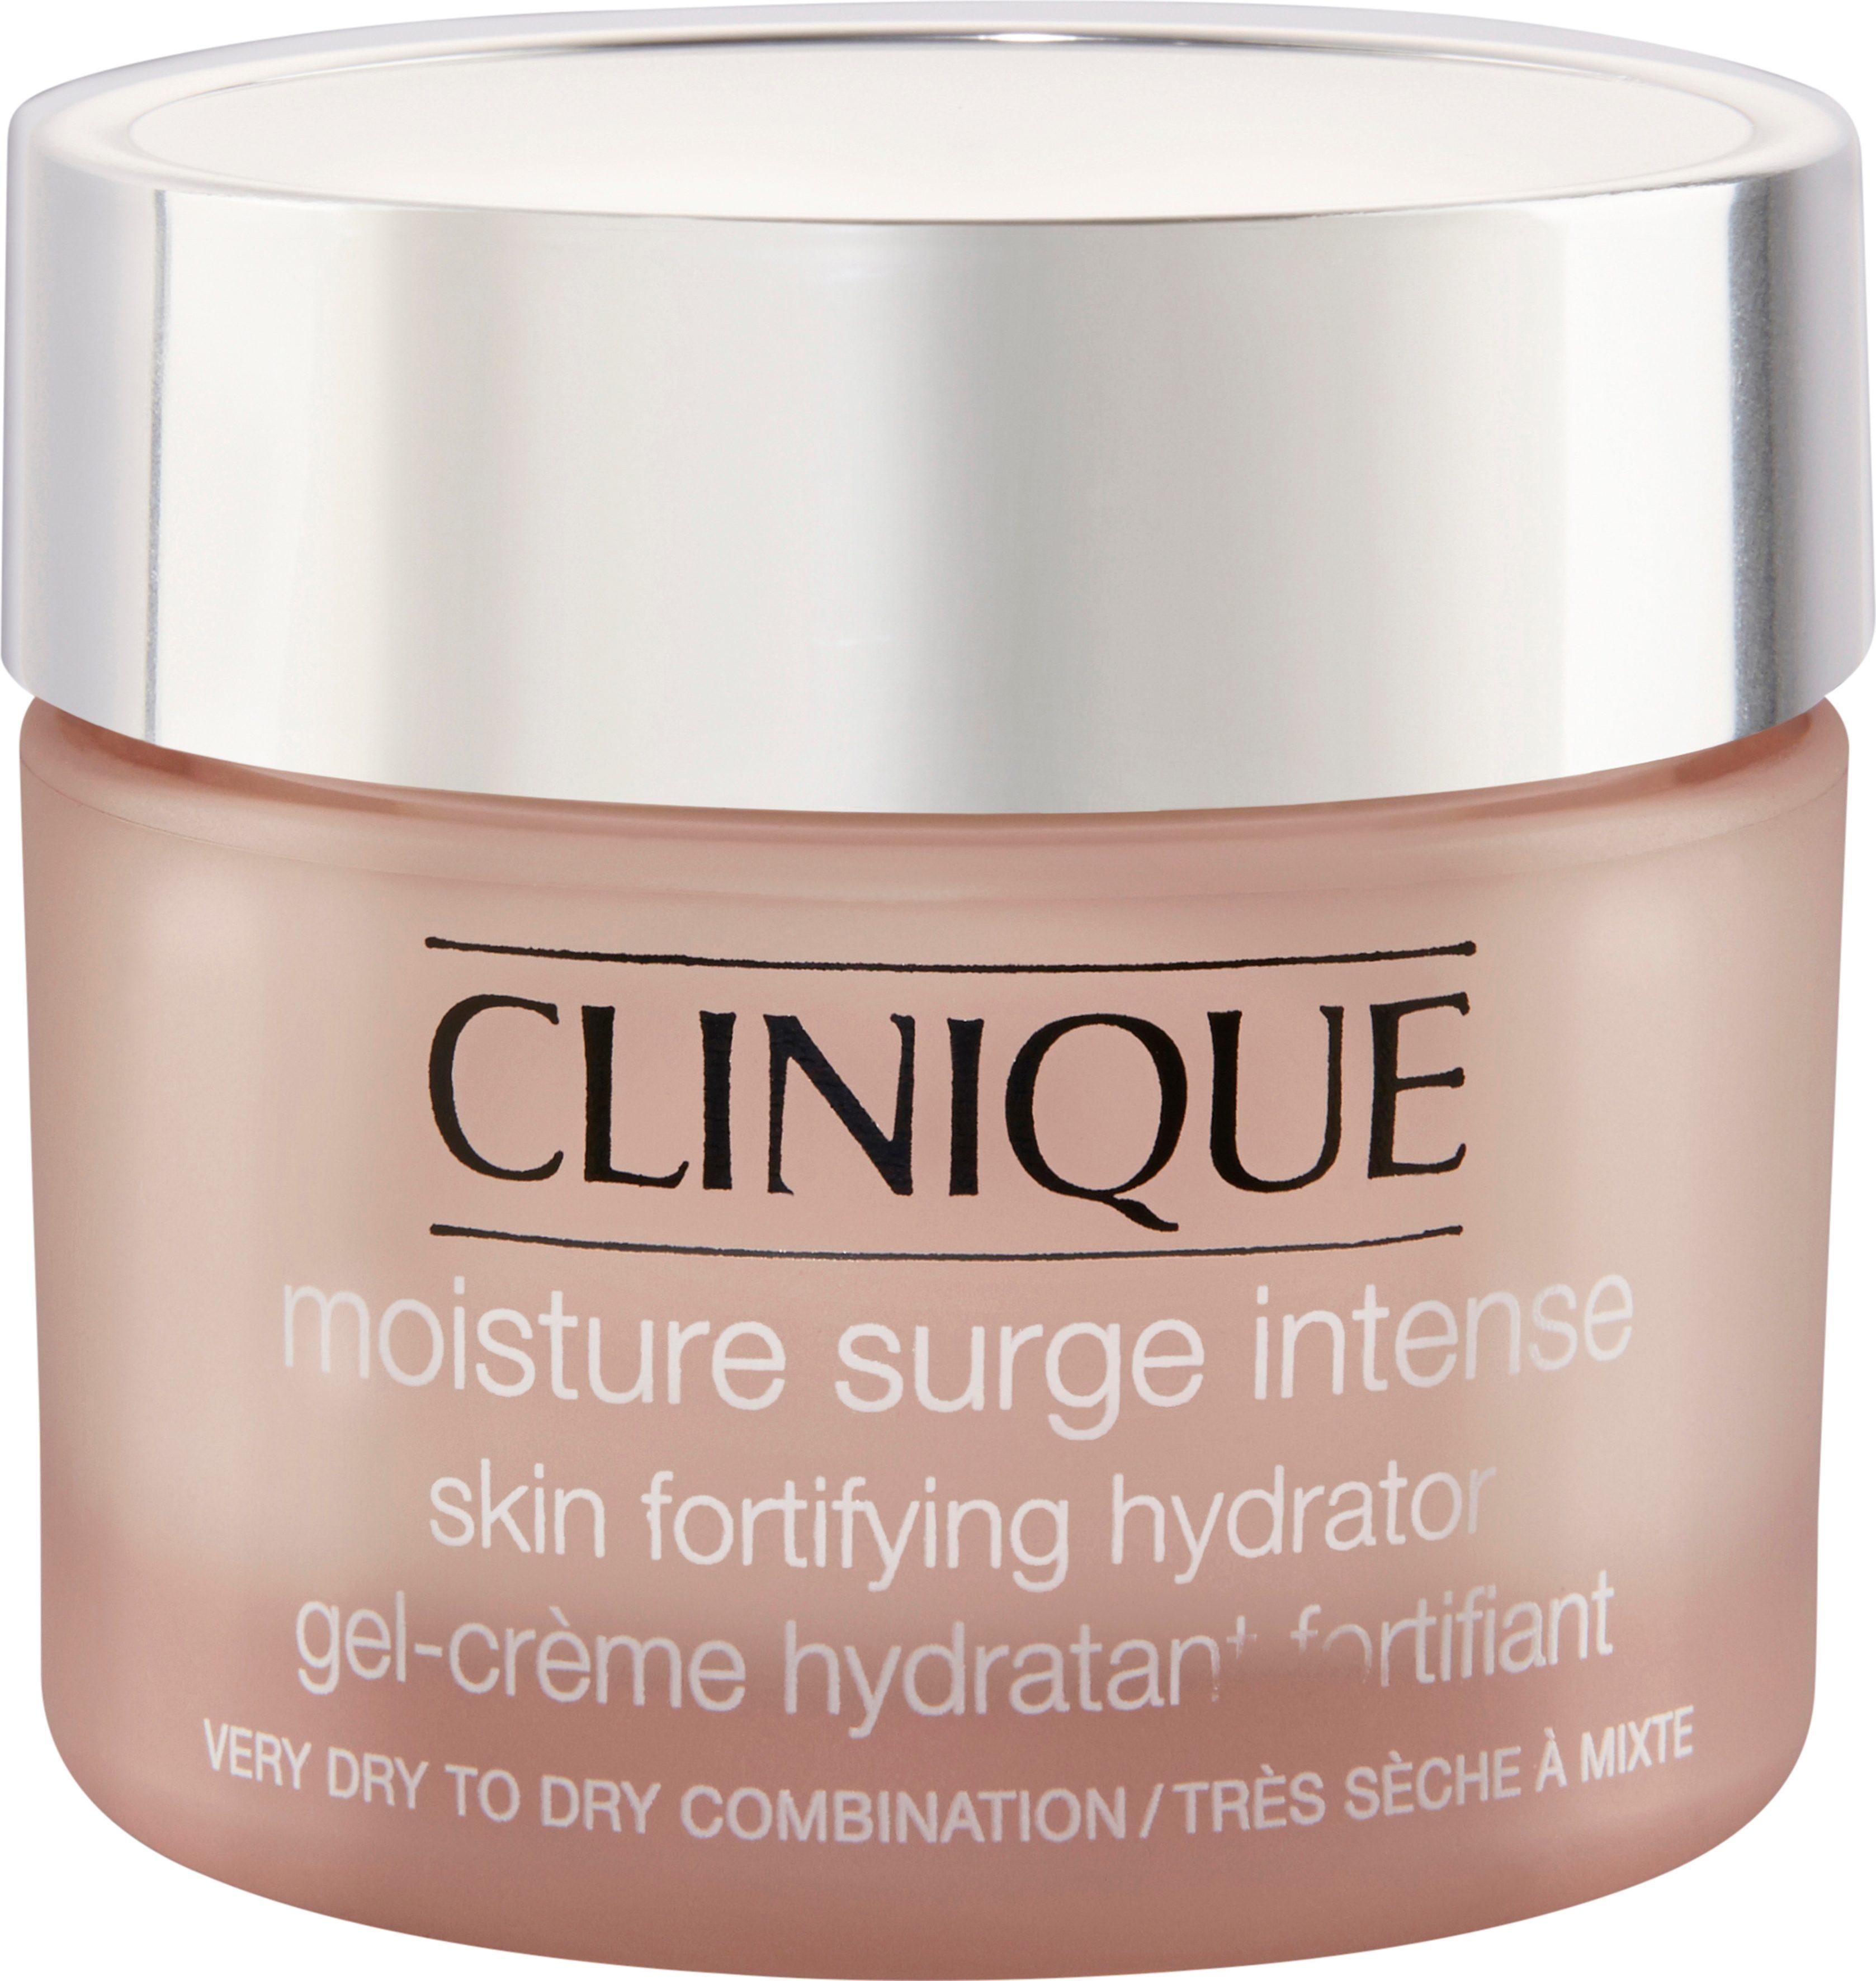 Clinique, »Moisture Surge Intense Skin Fortifying Hydrator«, Feuchtigkeitspflege